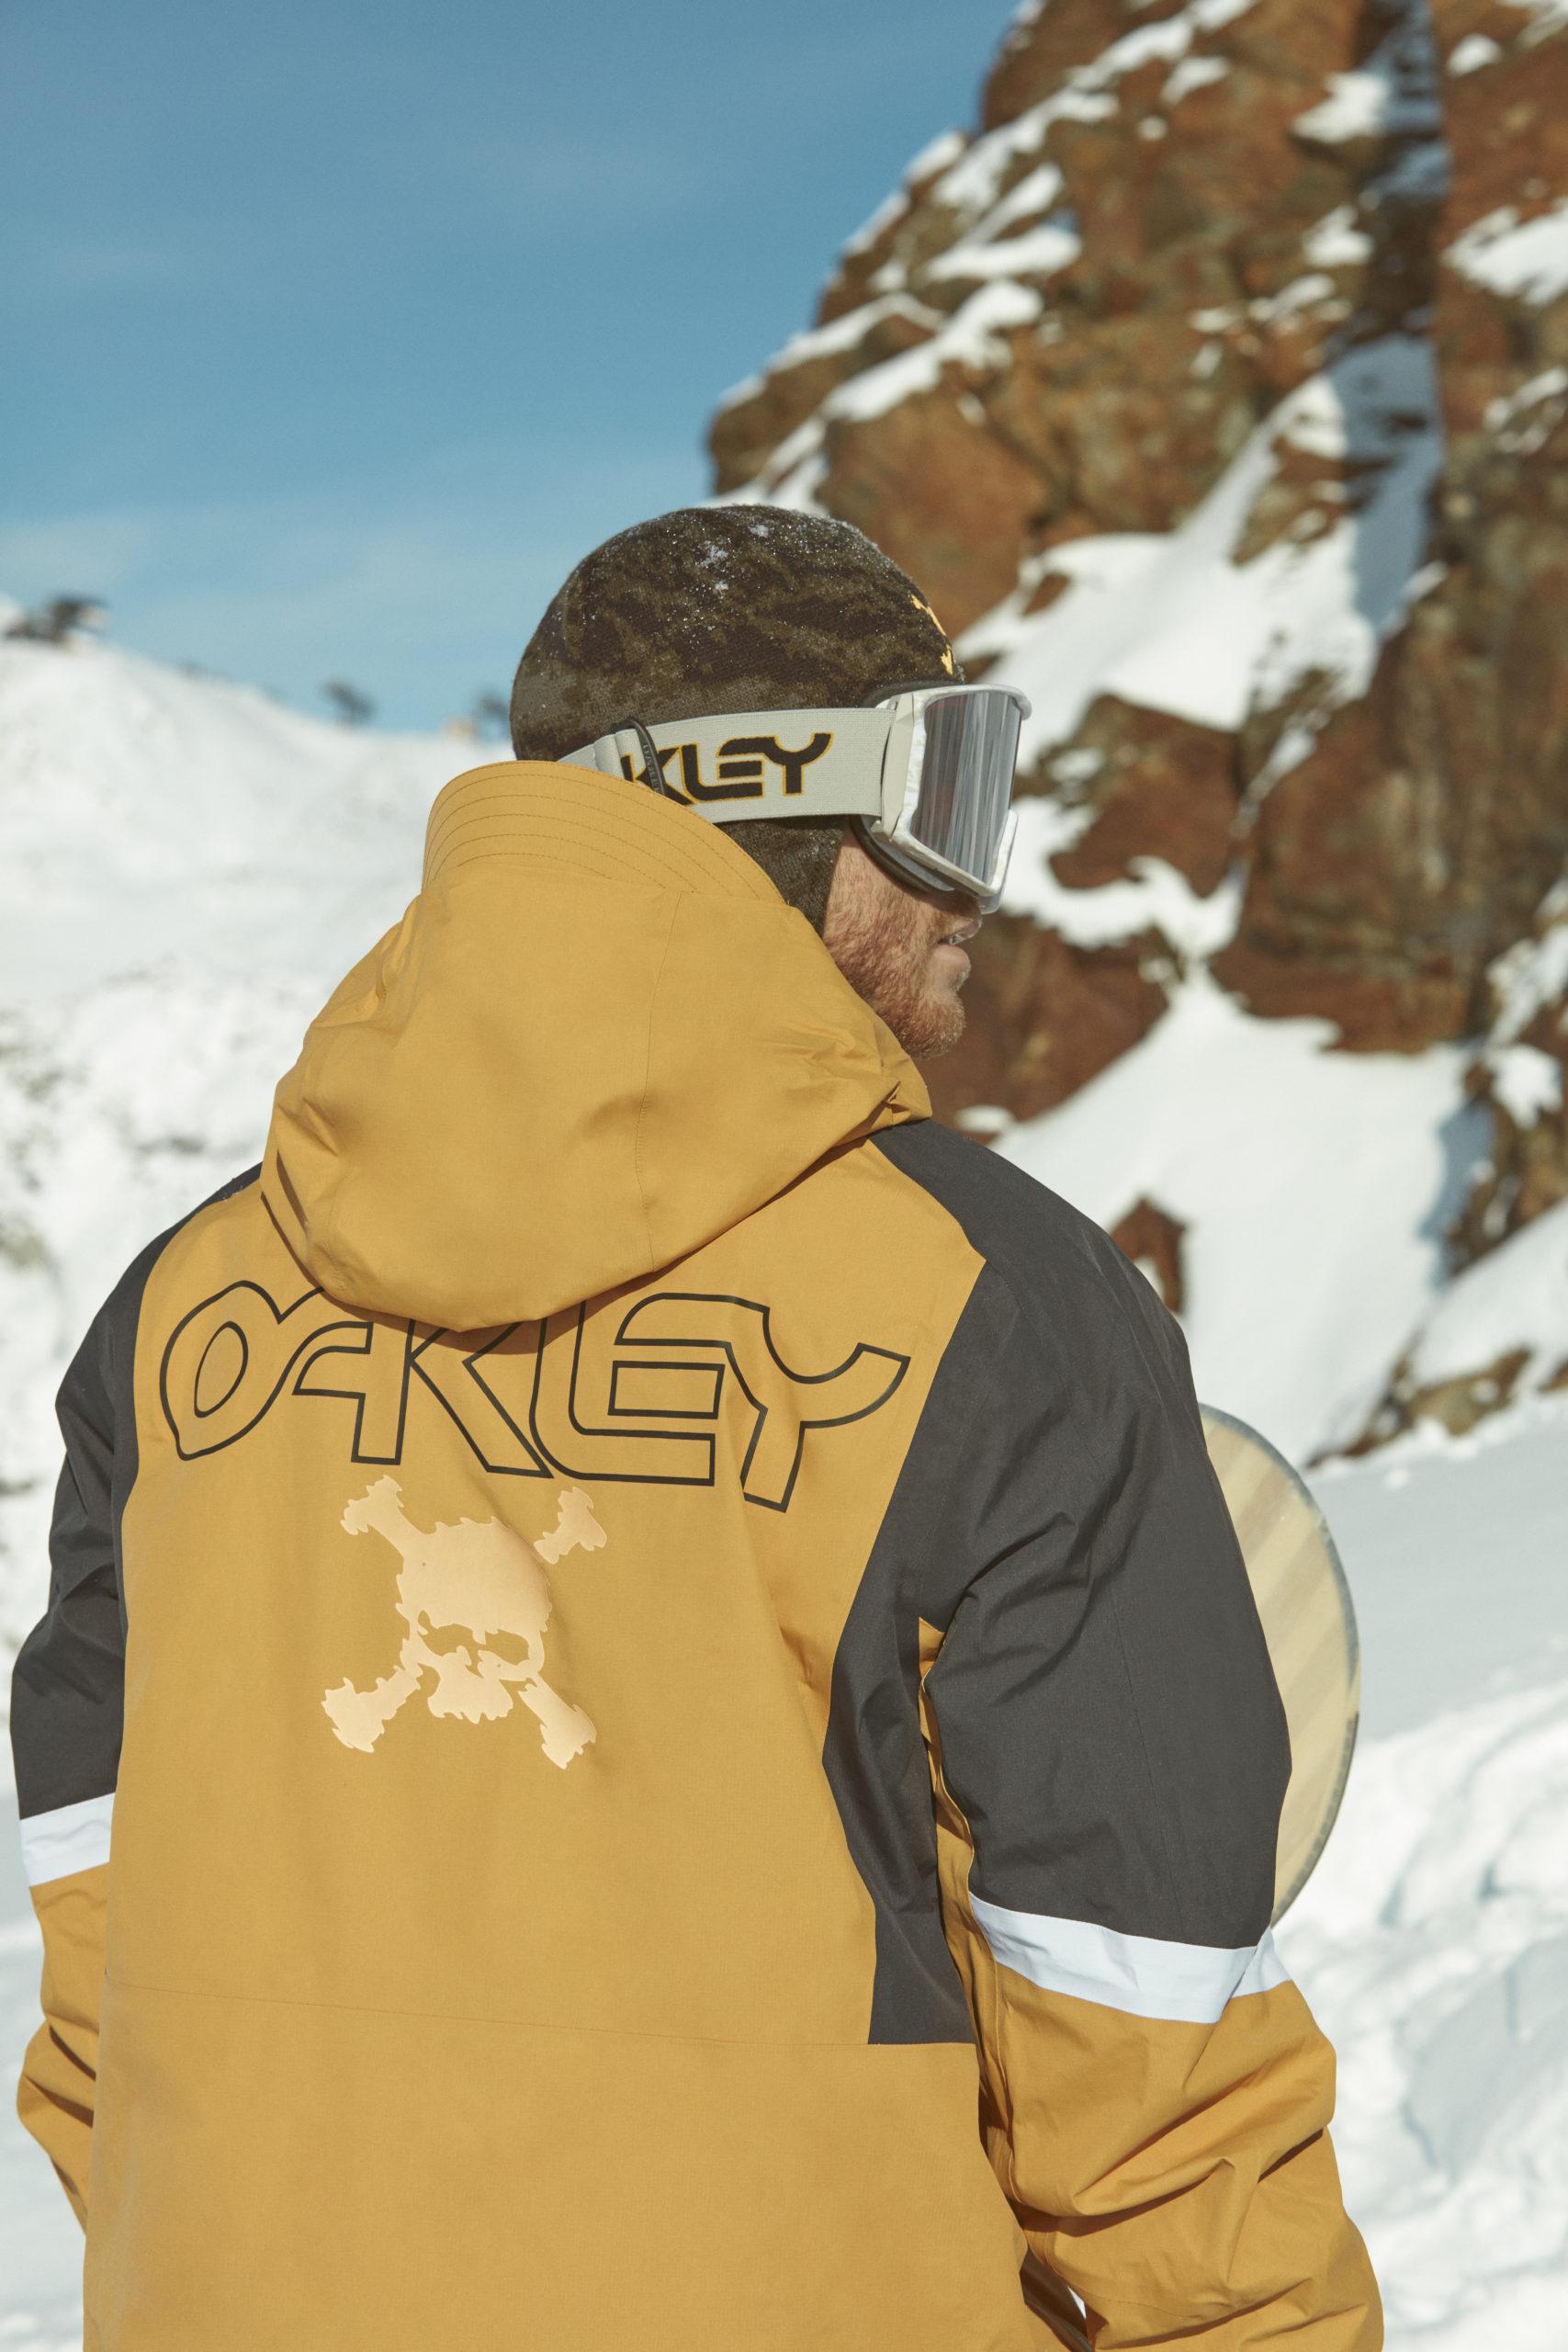 Oakley Team Collection Stale Sandbech